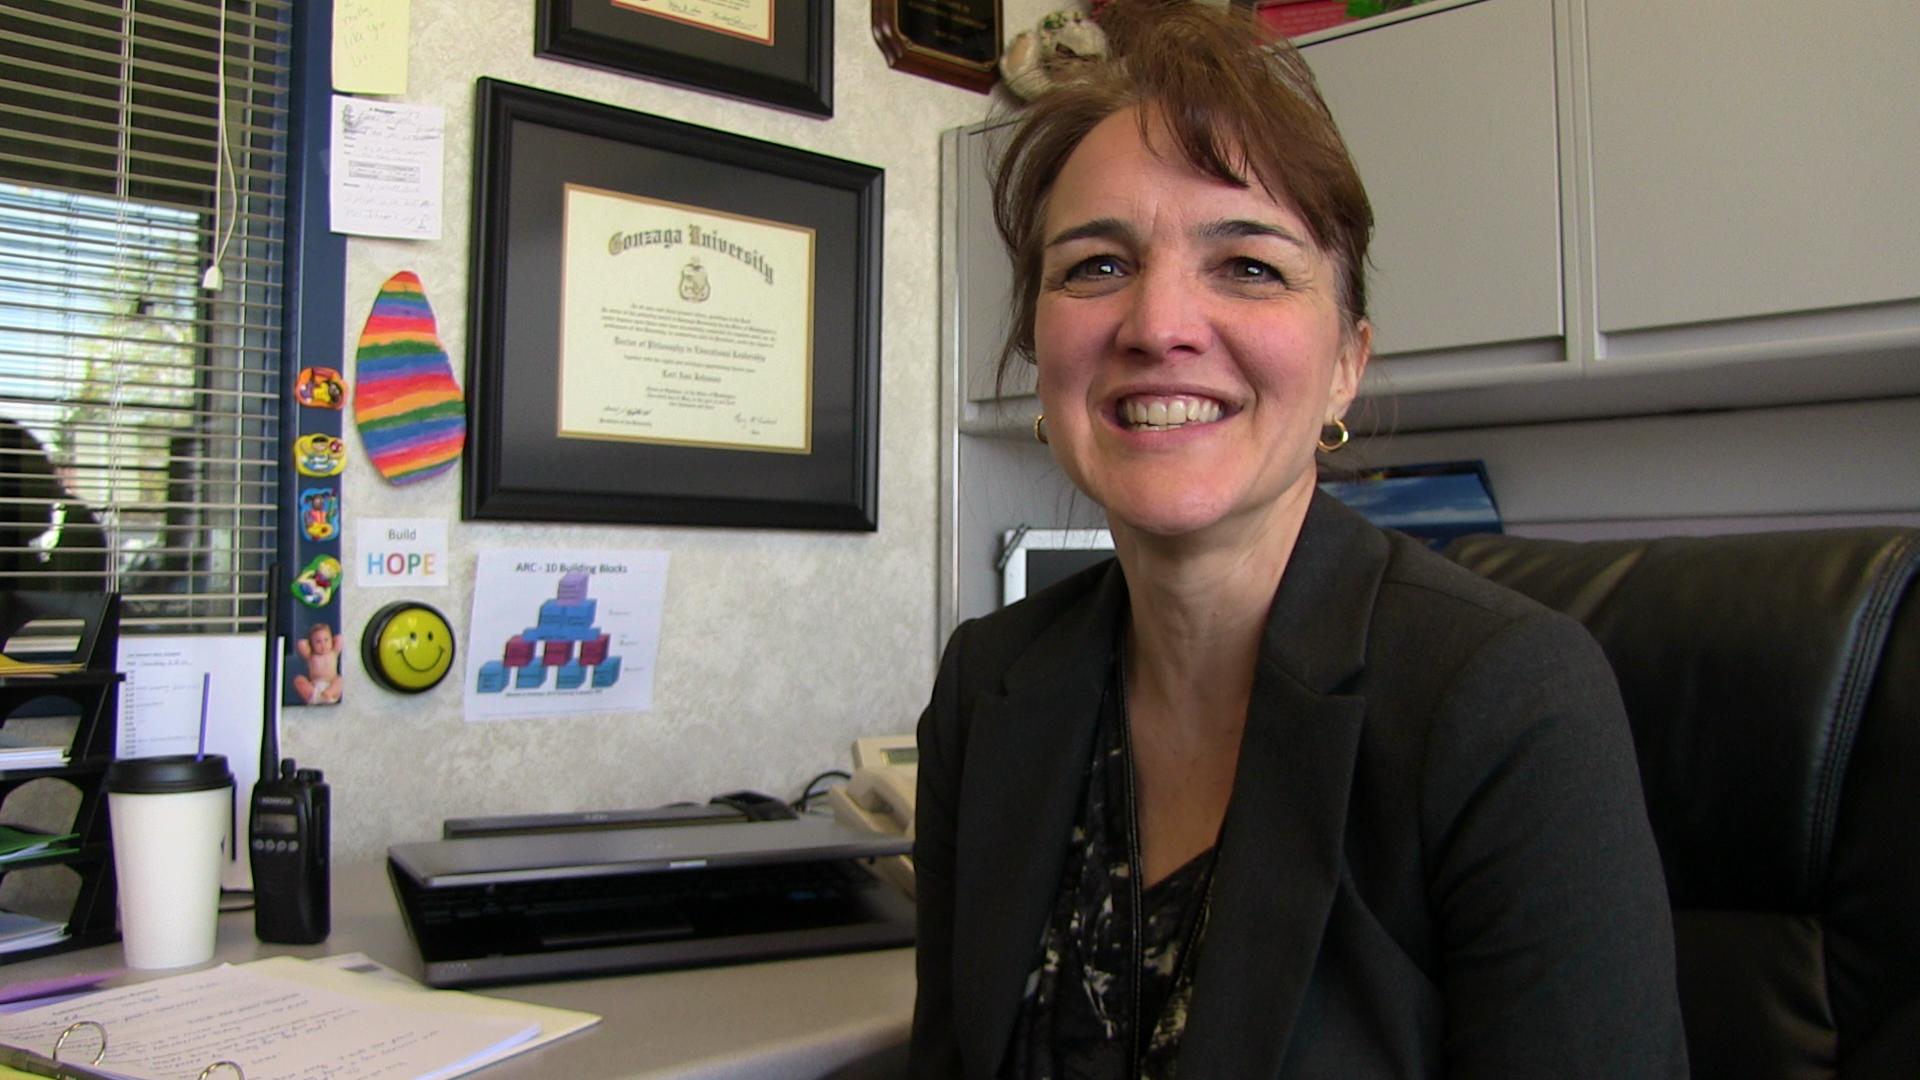 Lori Johnson, principal of Broadway Elementary School.